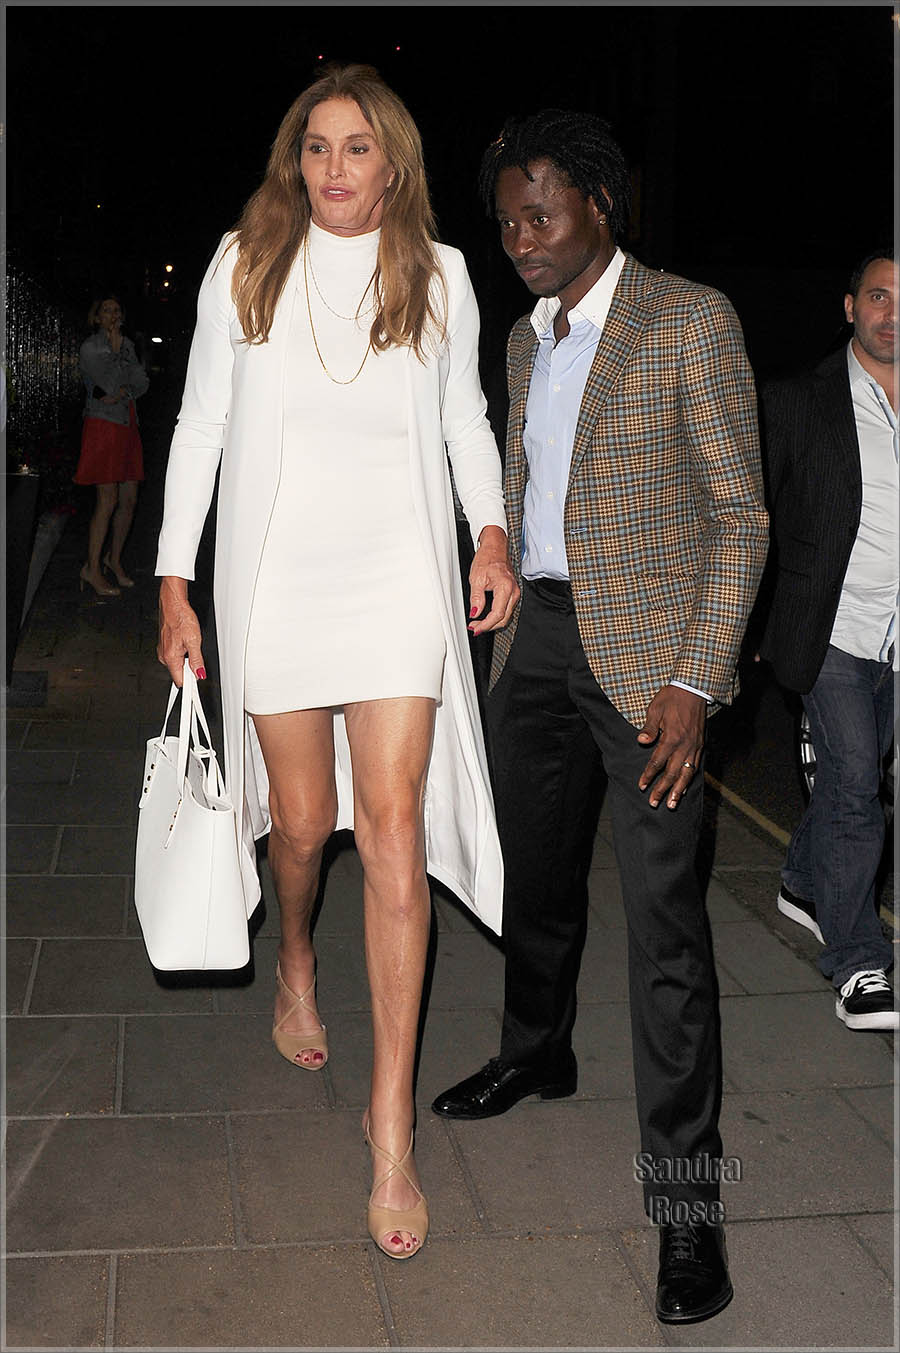 Bruce Caitlyn Jenner in London